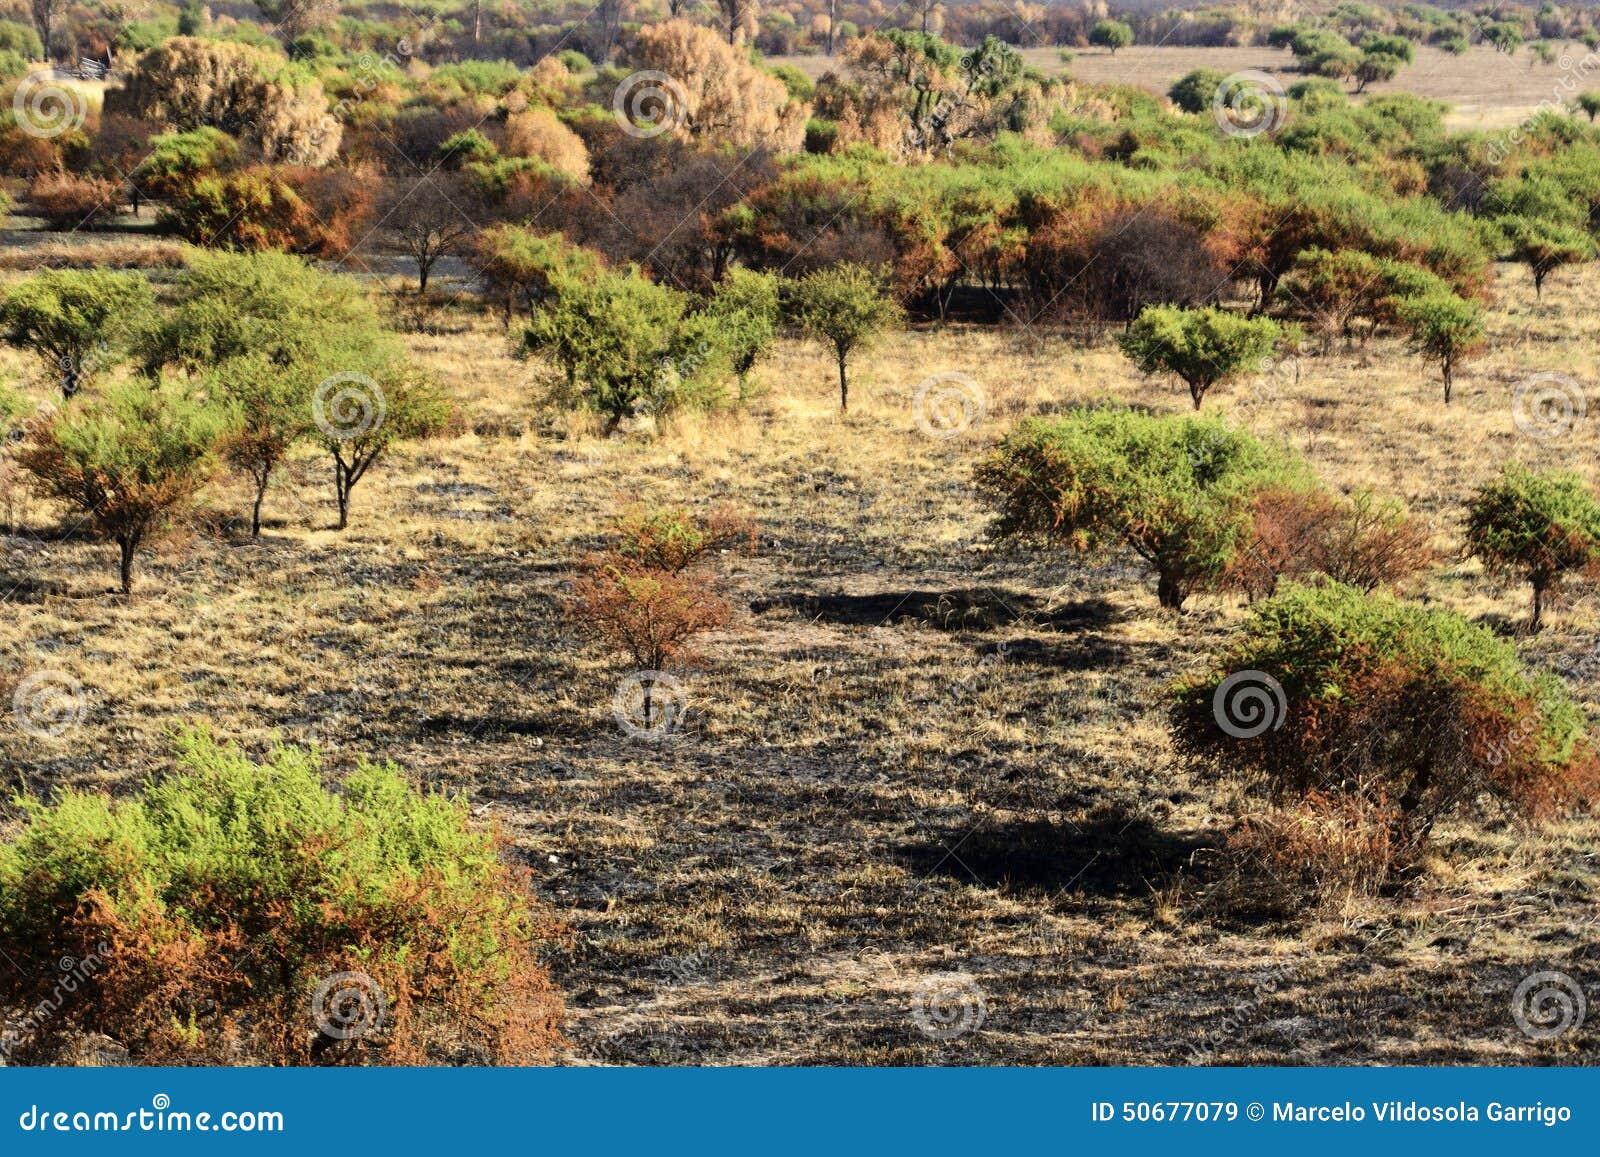 Download 被烧的结构树 库存图片. 图片 包括有 草甸, 使荒凉的, 生态, 投反对票, 结构树, 灾害, 横向, 然后 - 50677079